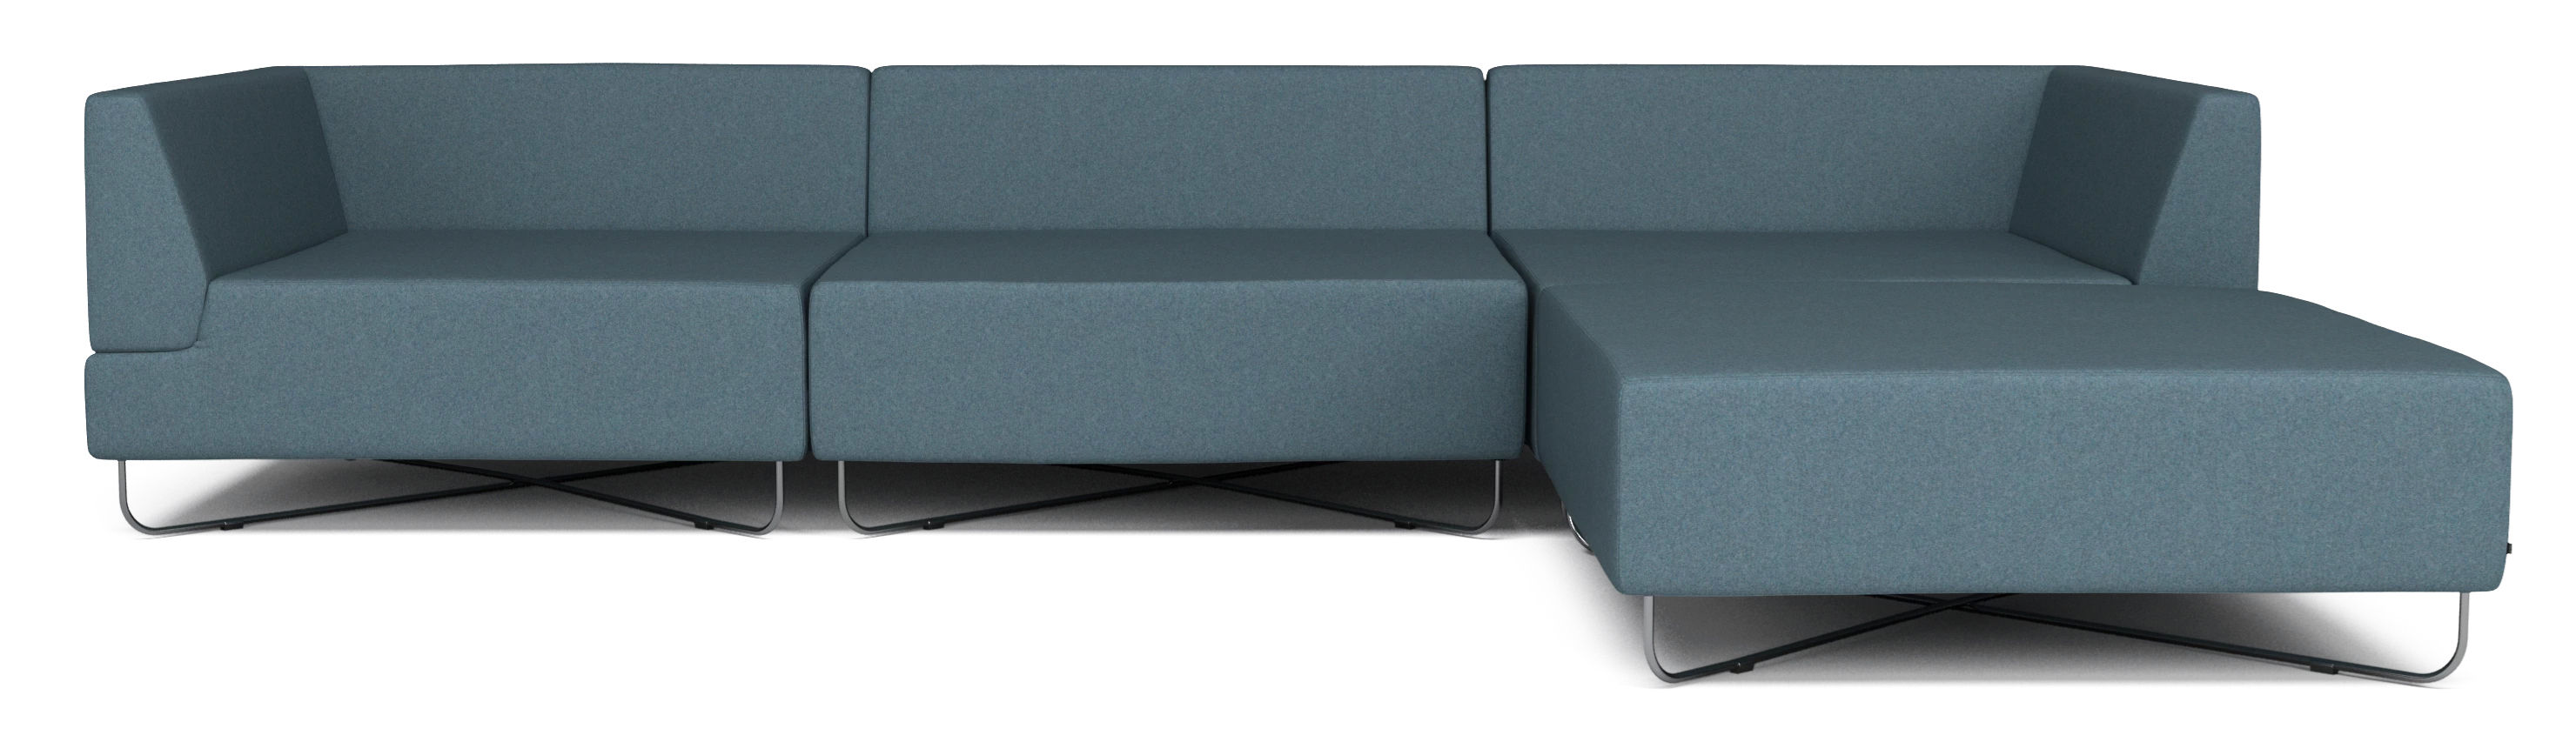 canap modulable orlando module central module central. Black Bedroom Furniture Sets. Home Design Ideas